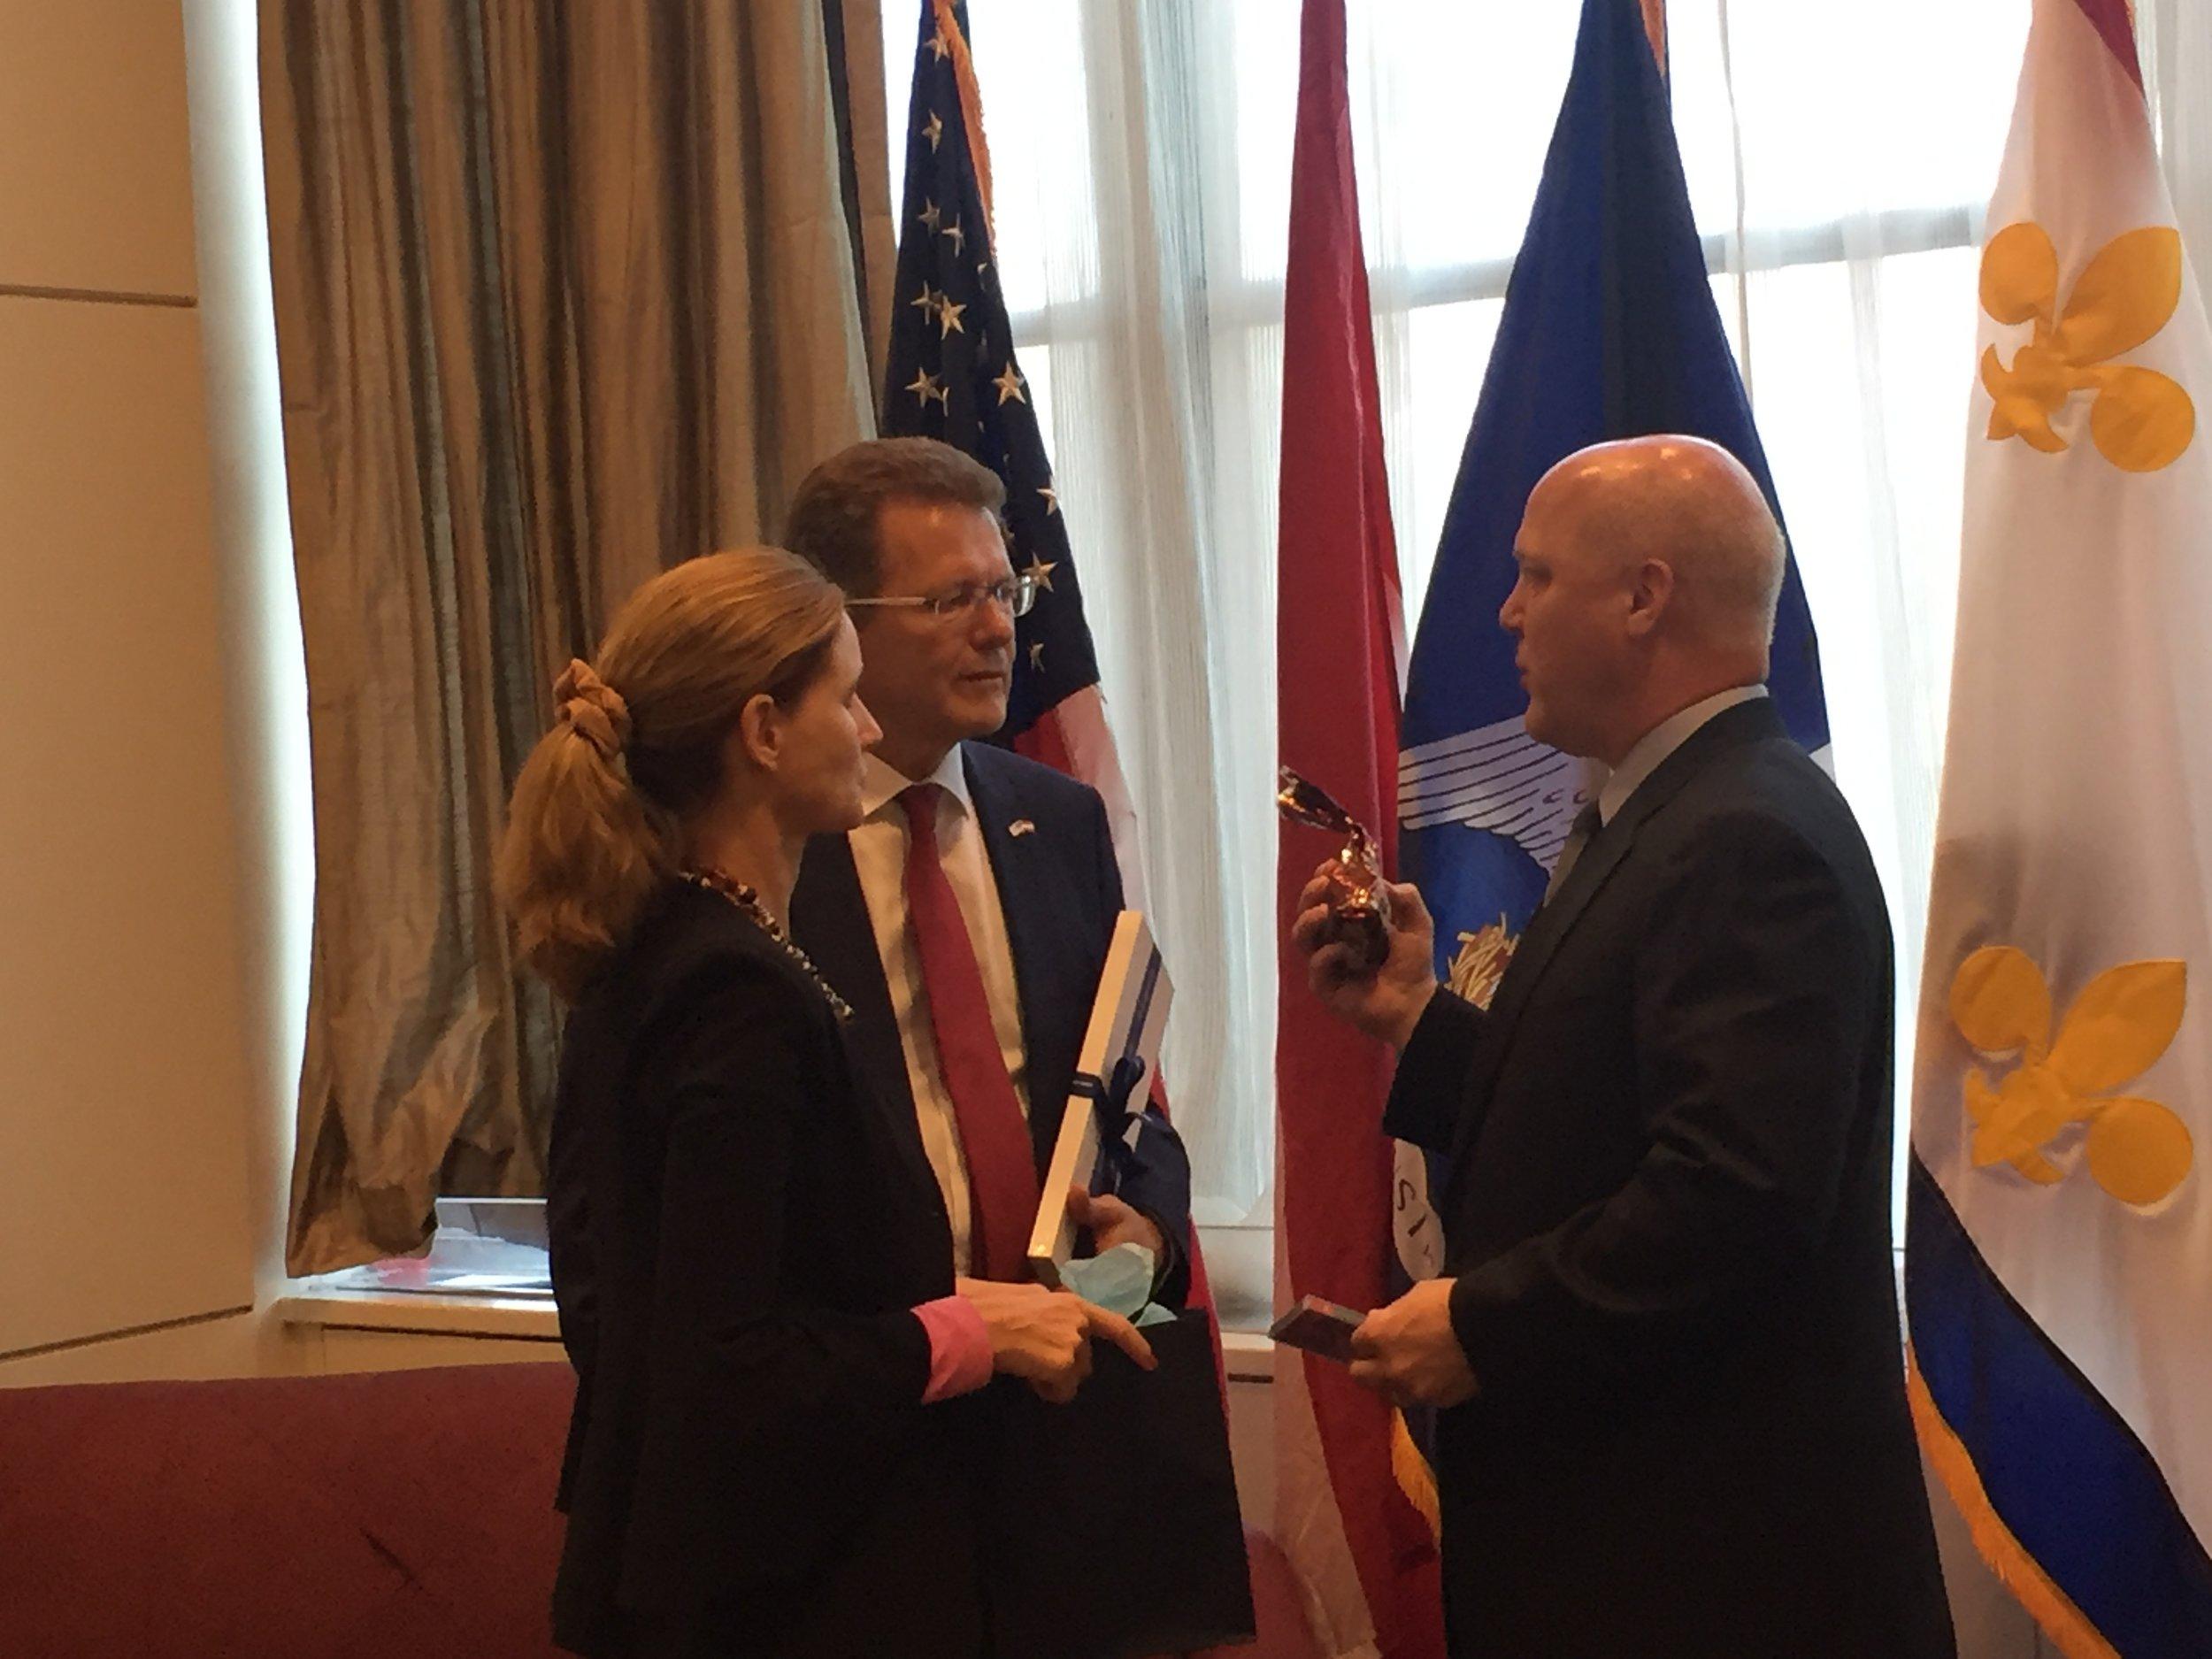 From left: Dr. Gudrun Waldner Faudon, Ambassador Wolfgang Waldner, Mayor Mitch Landrieu.